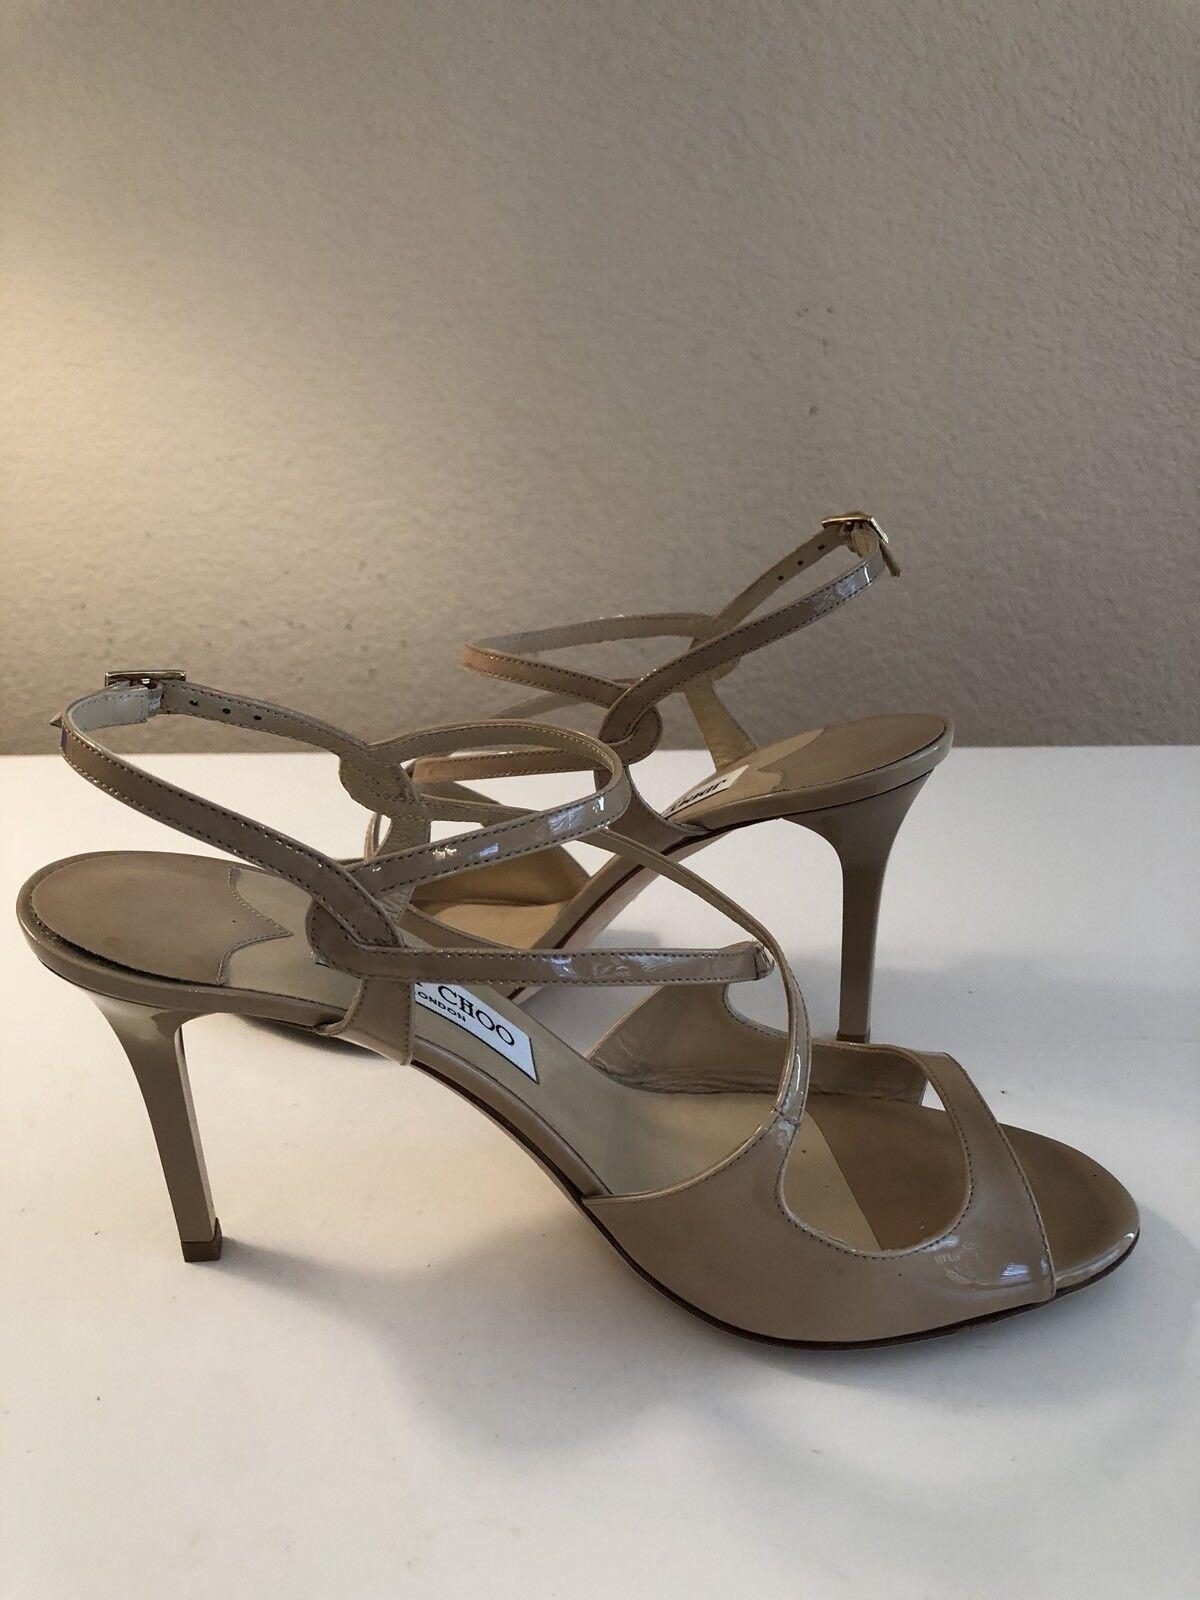 Women's JIMMY CHOO Paxton Paxton Paxton Style Nude Patent Sandals - EU 39 US 8.5-9 dd4cbd